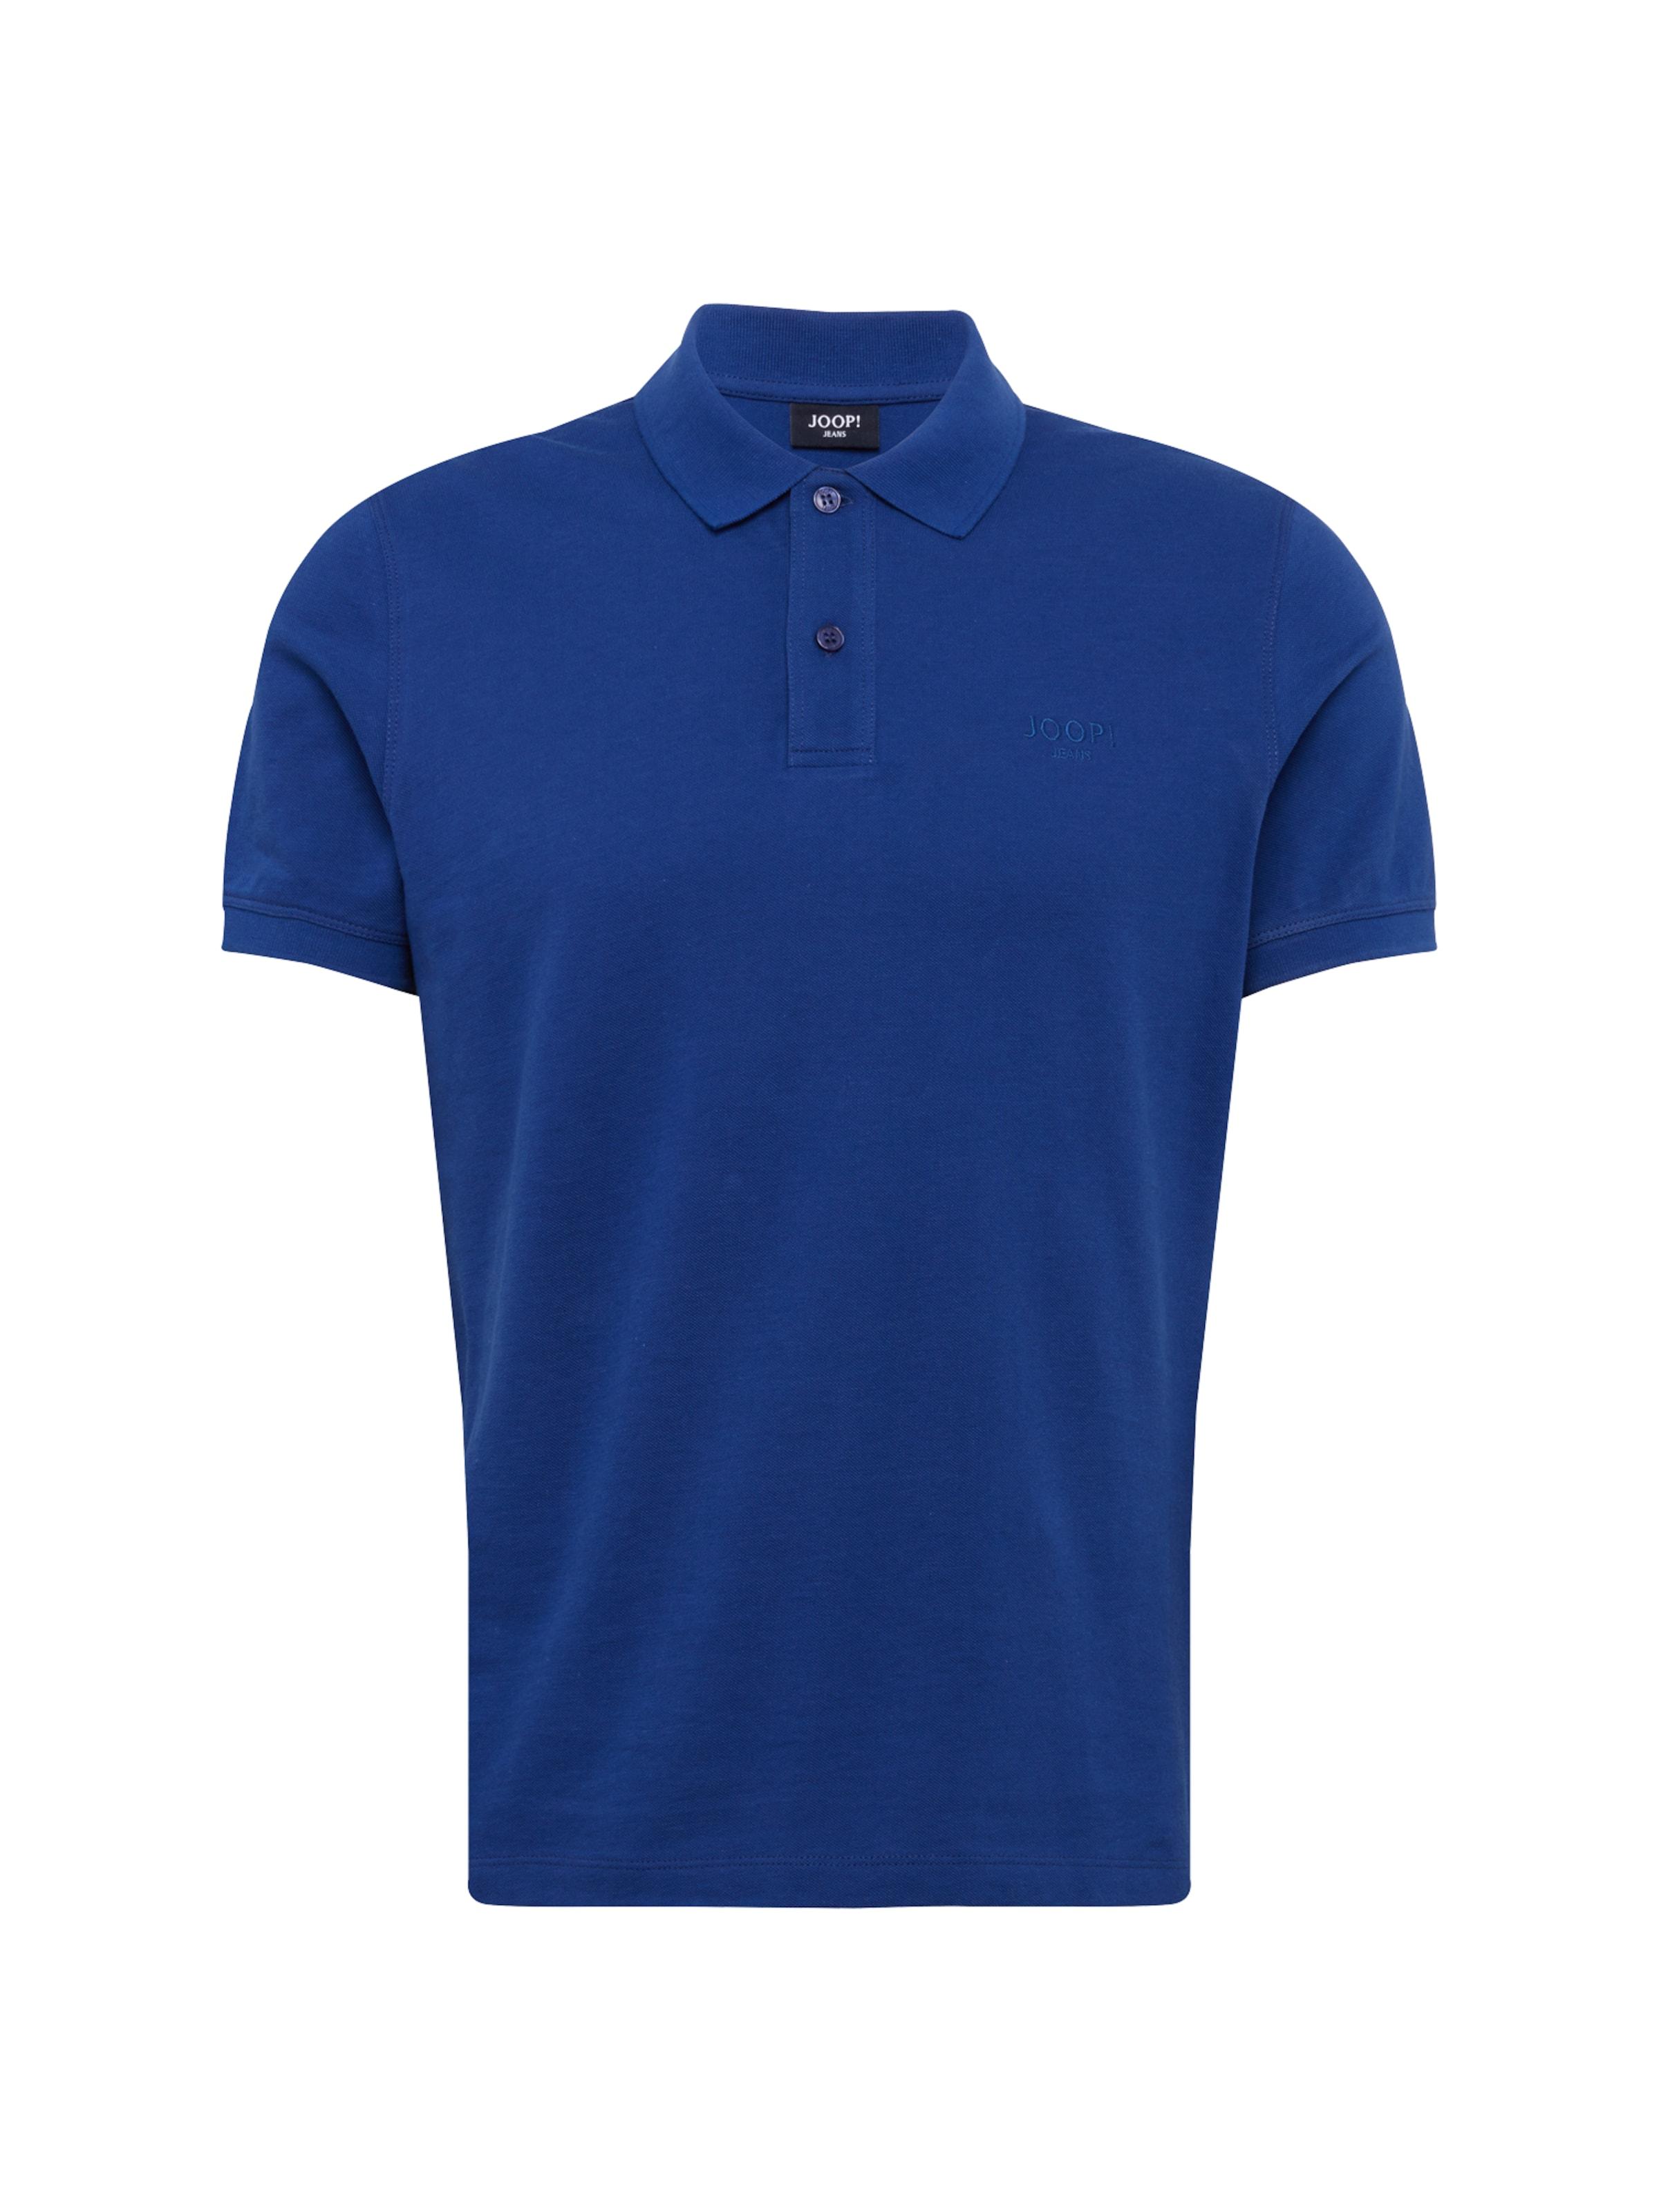 Bleu Jjj T shirt 01beeke Joop 10007590' '15 En R0q6wBP